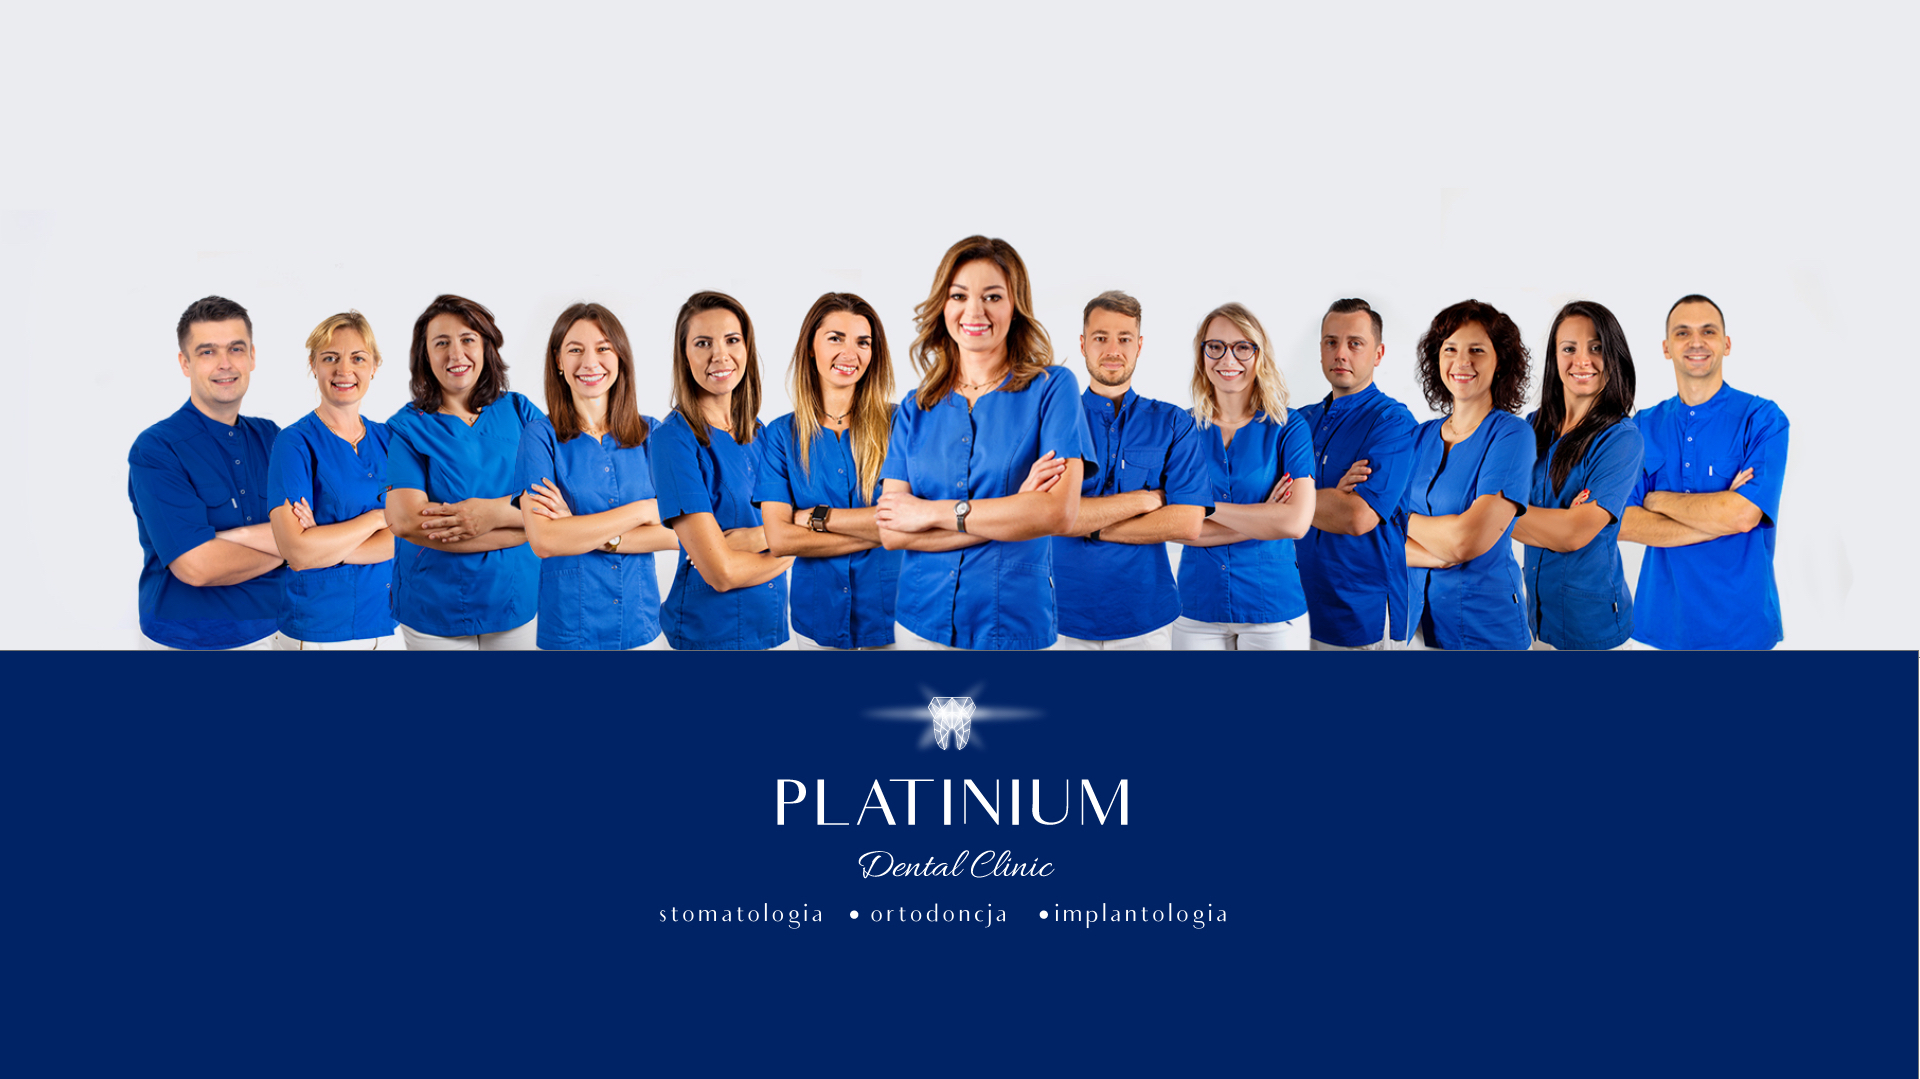 logo - platinium dental clinic